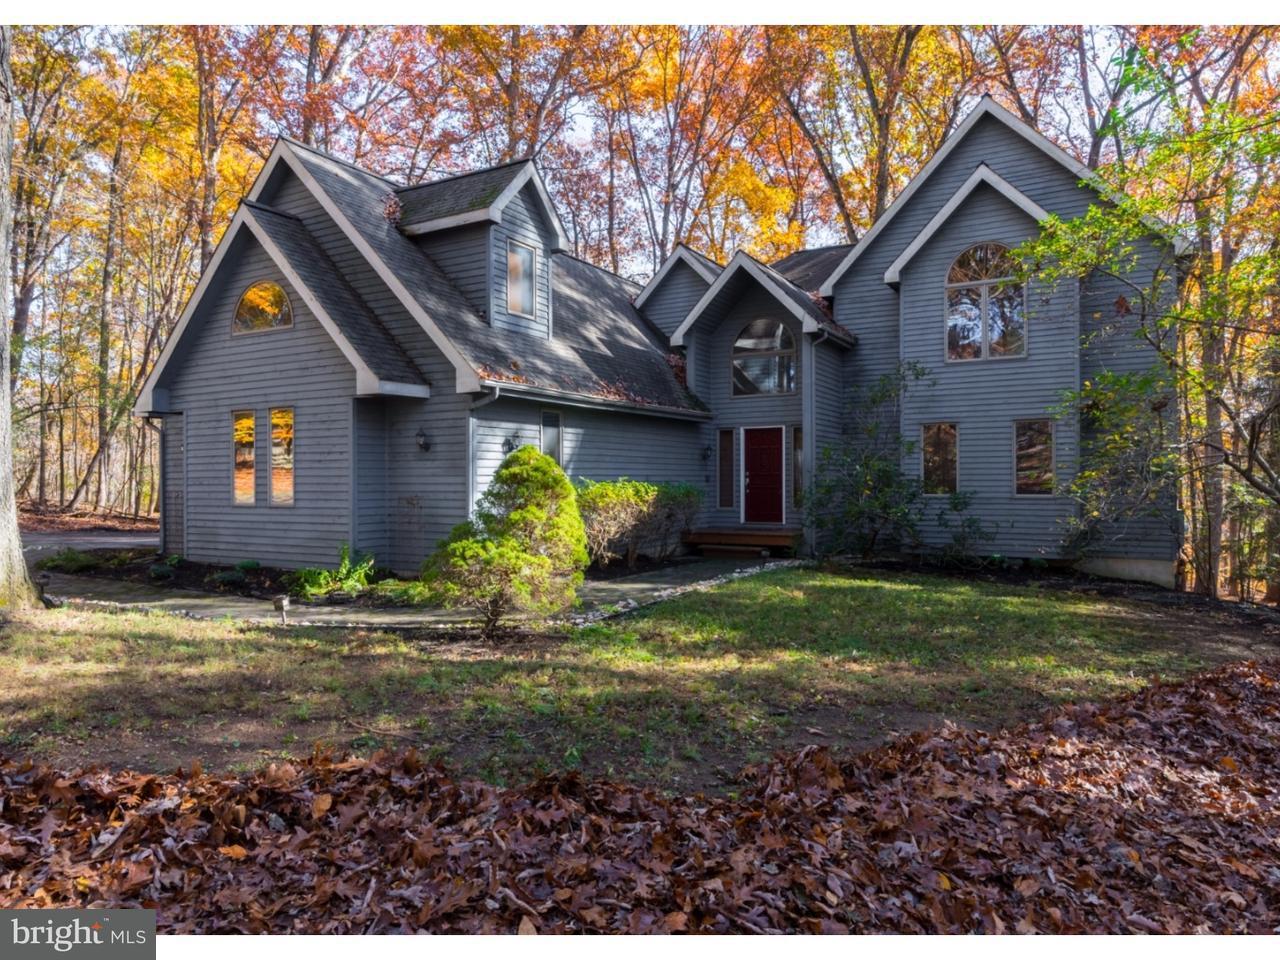 1095  Oak Creek West Chester , PA 19380